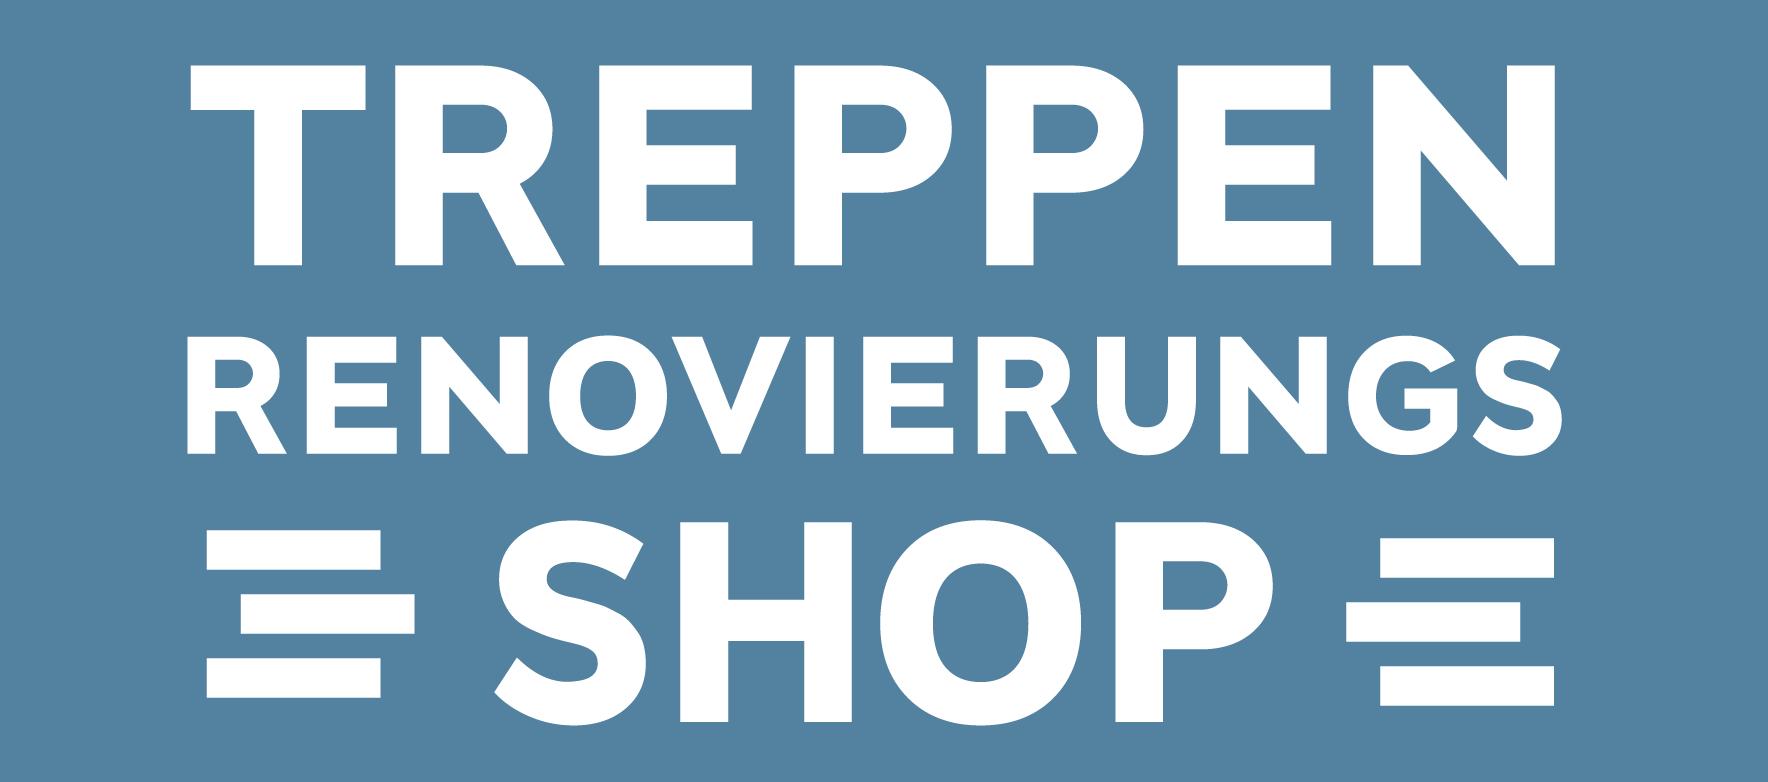 Treppenrenovierungs-Shop